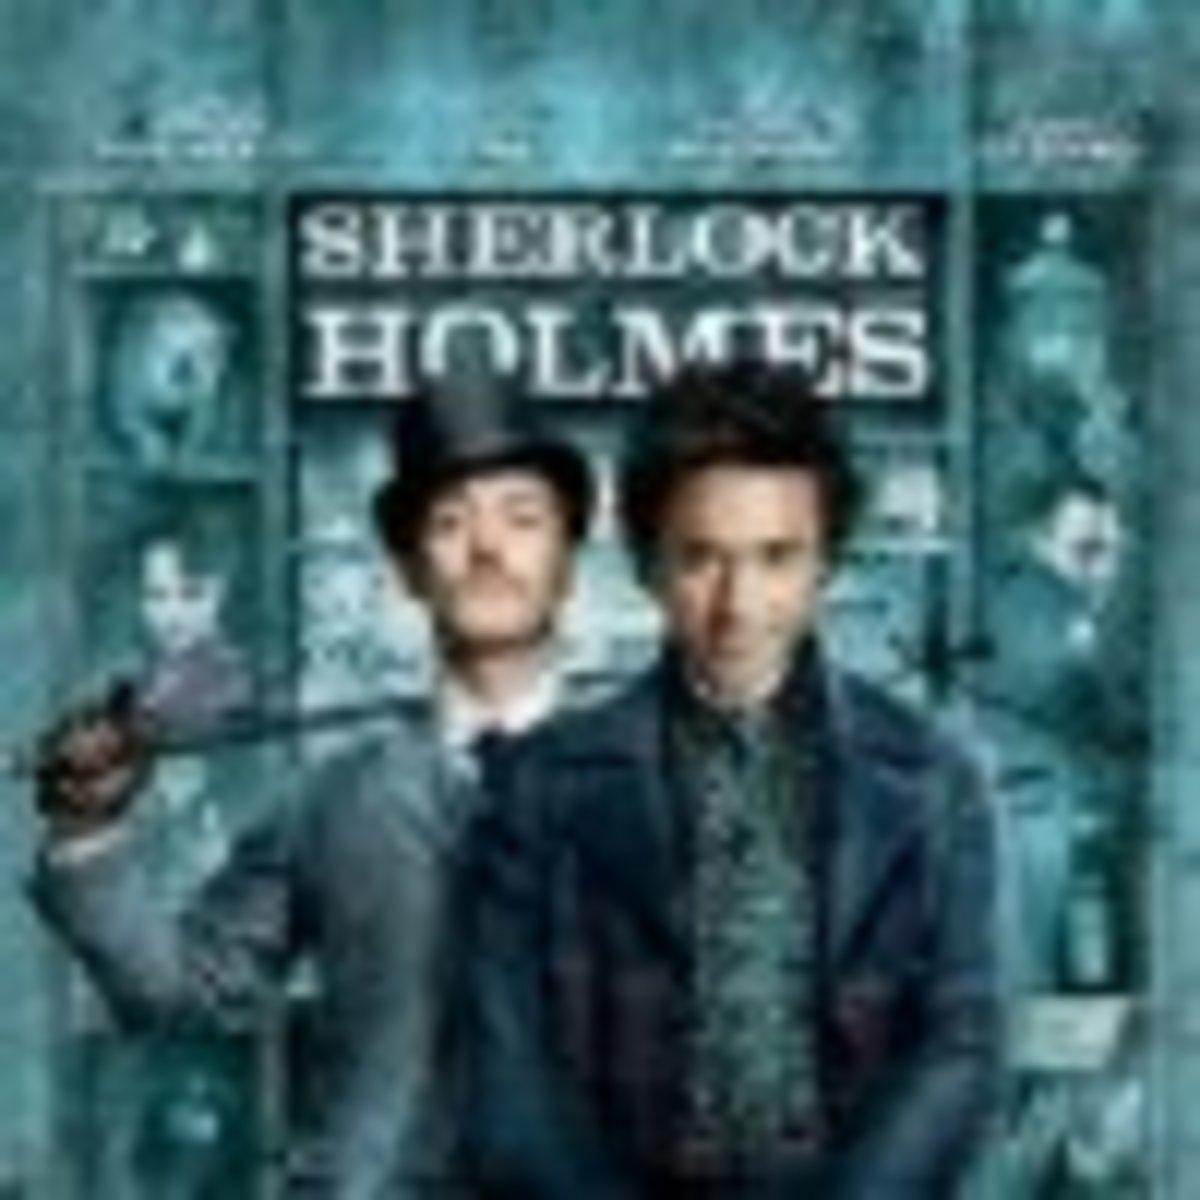 Sherlock Holmes Film Review